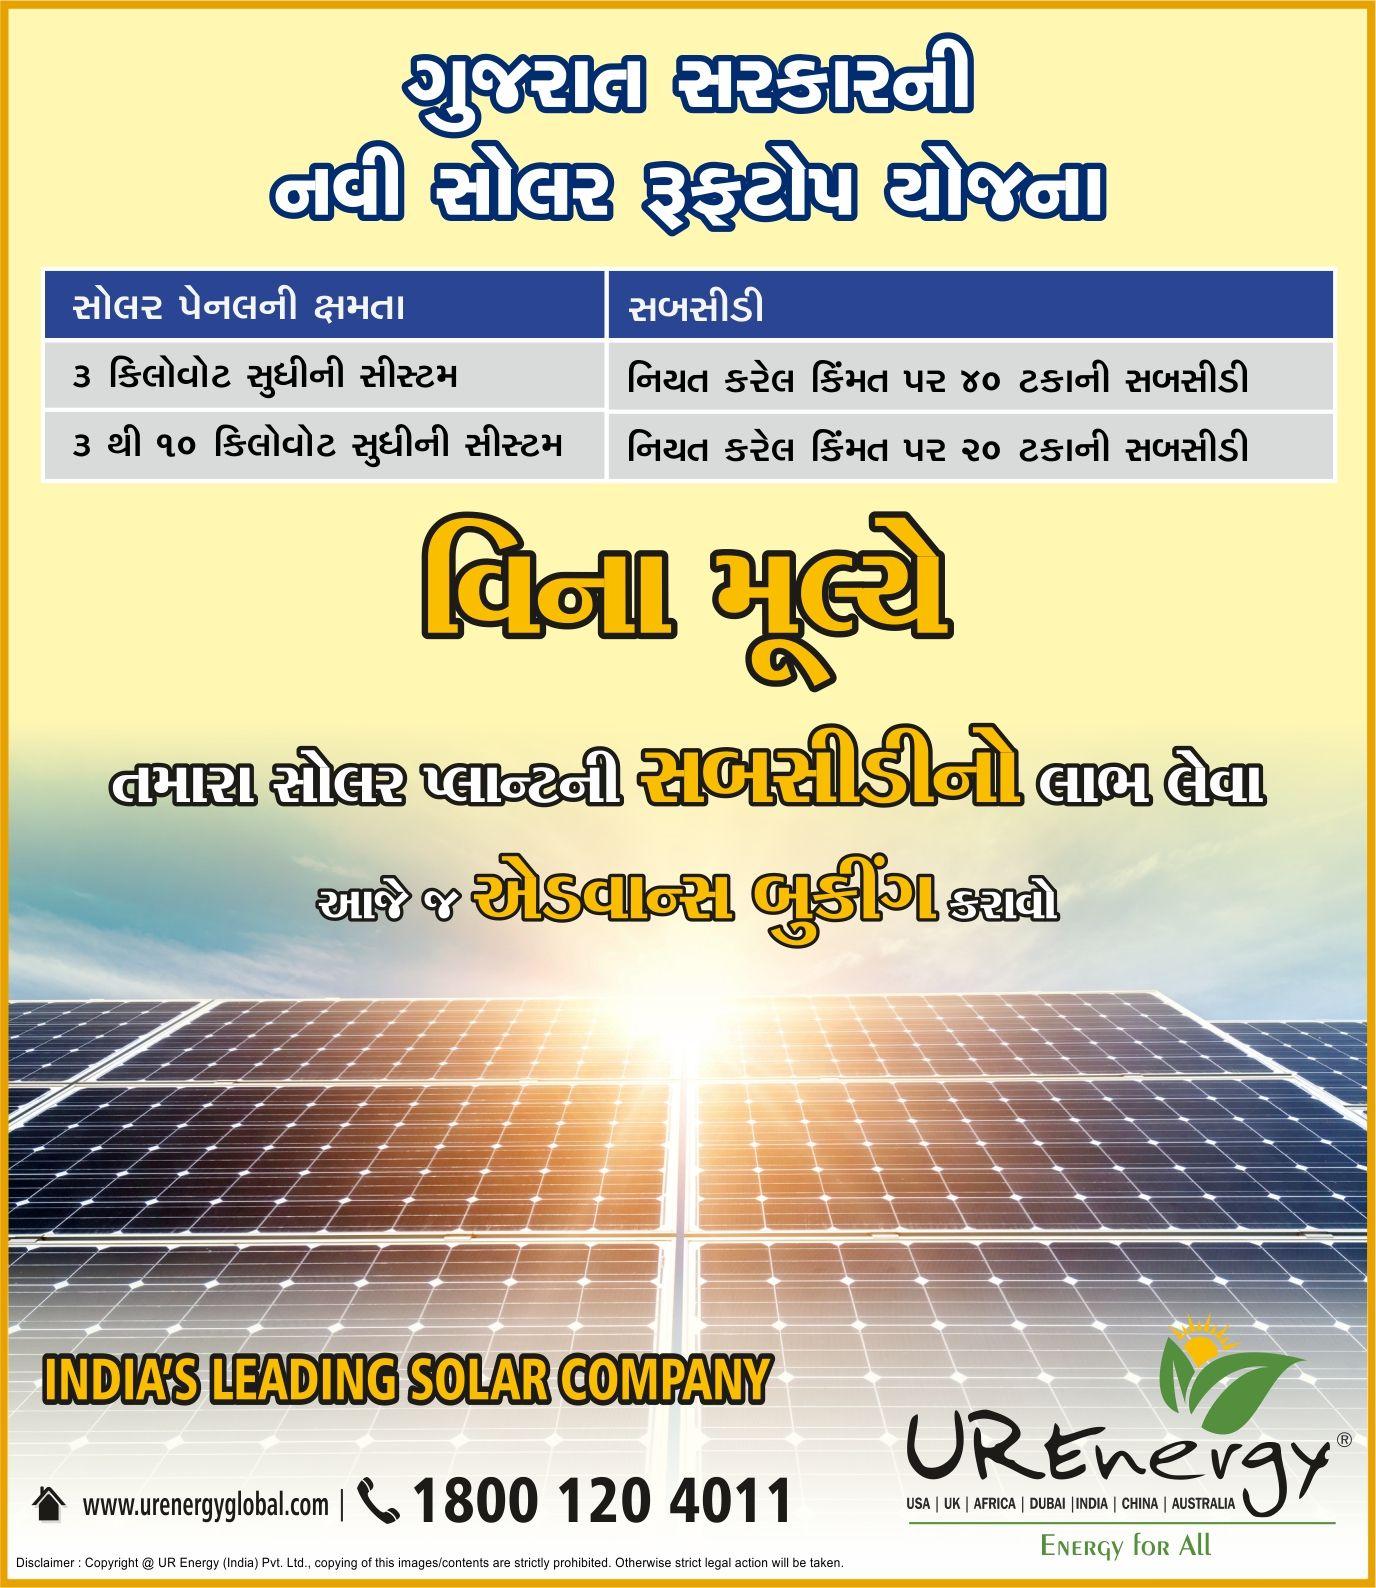 Rooftop Solar Panel Inverters Water Pump Solar Epc Gujarat India U R Energy Renewable Energy Companies Solar Solar Water Pump